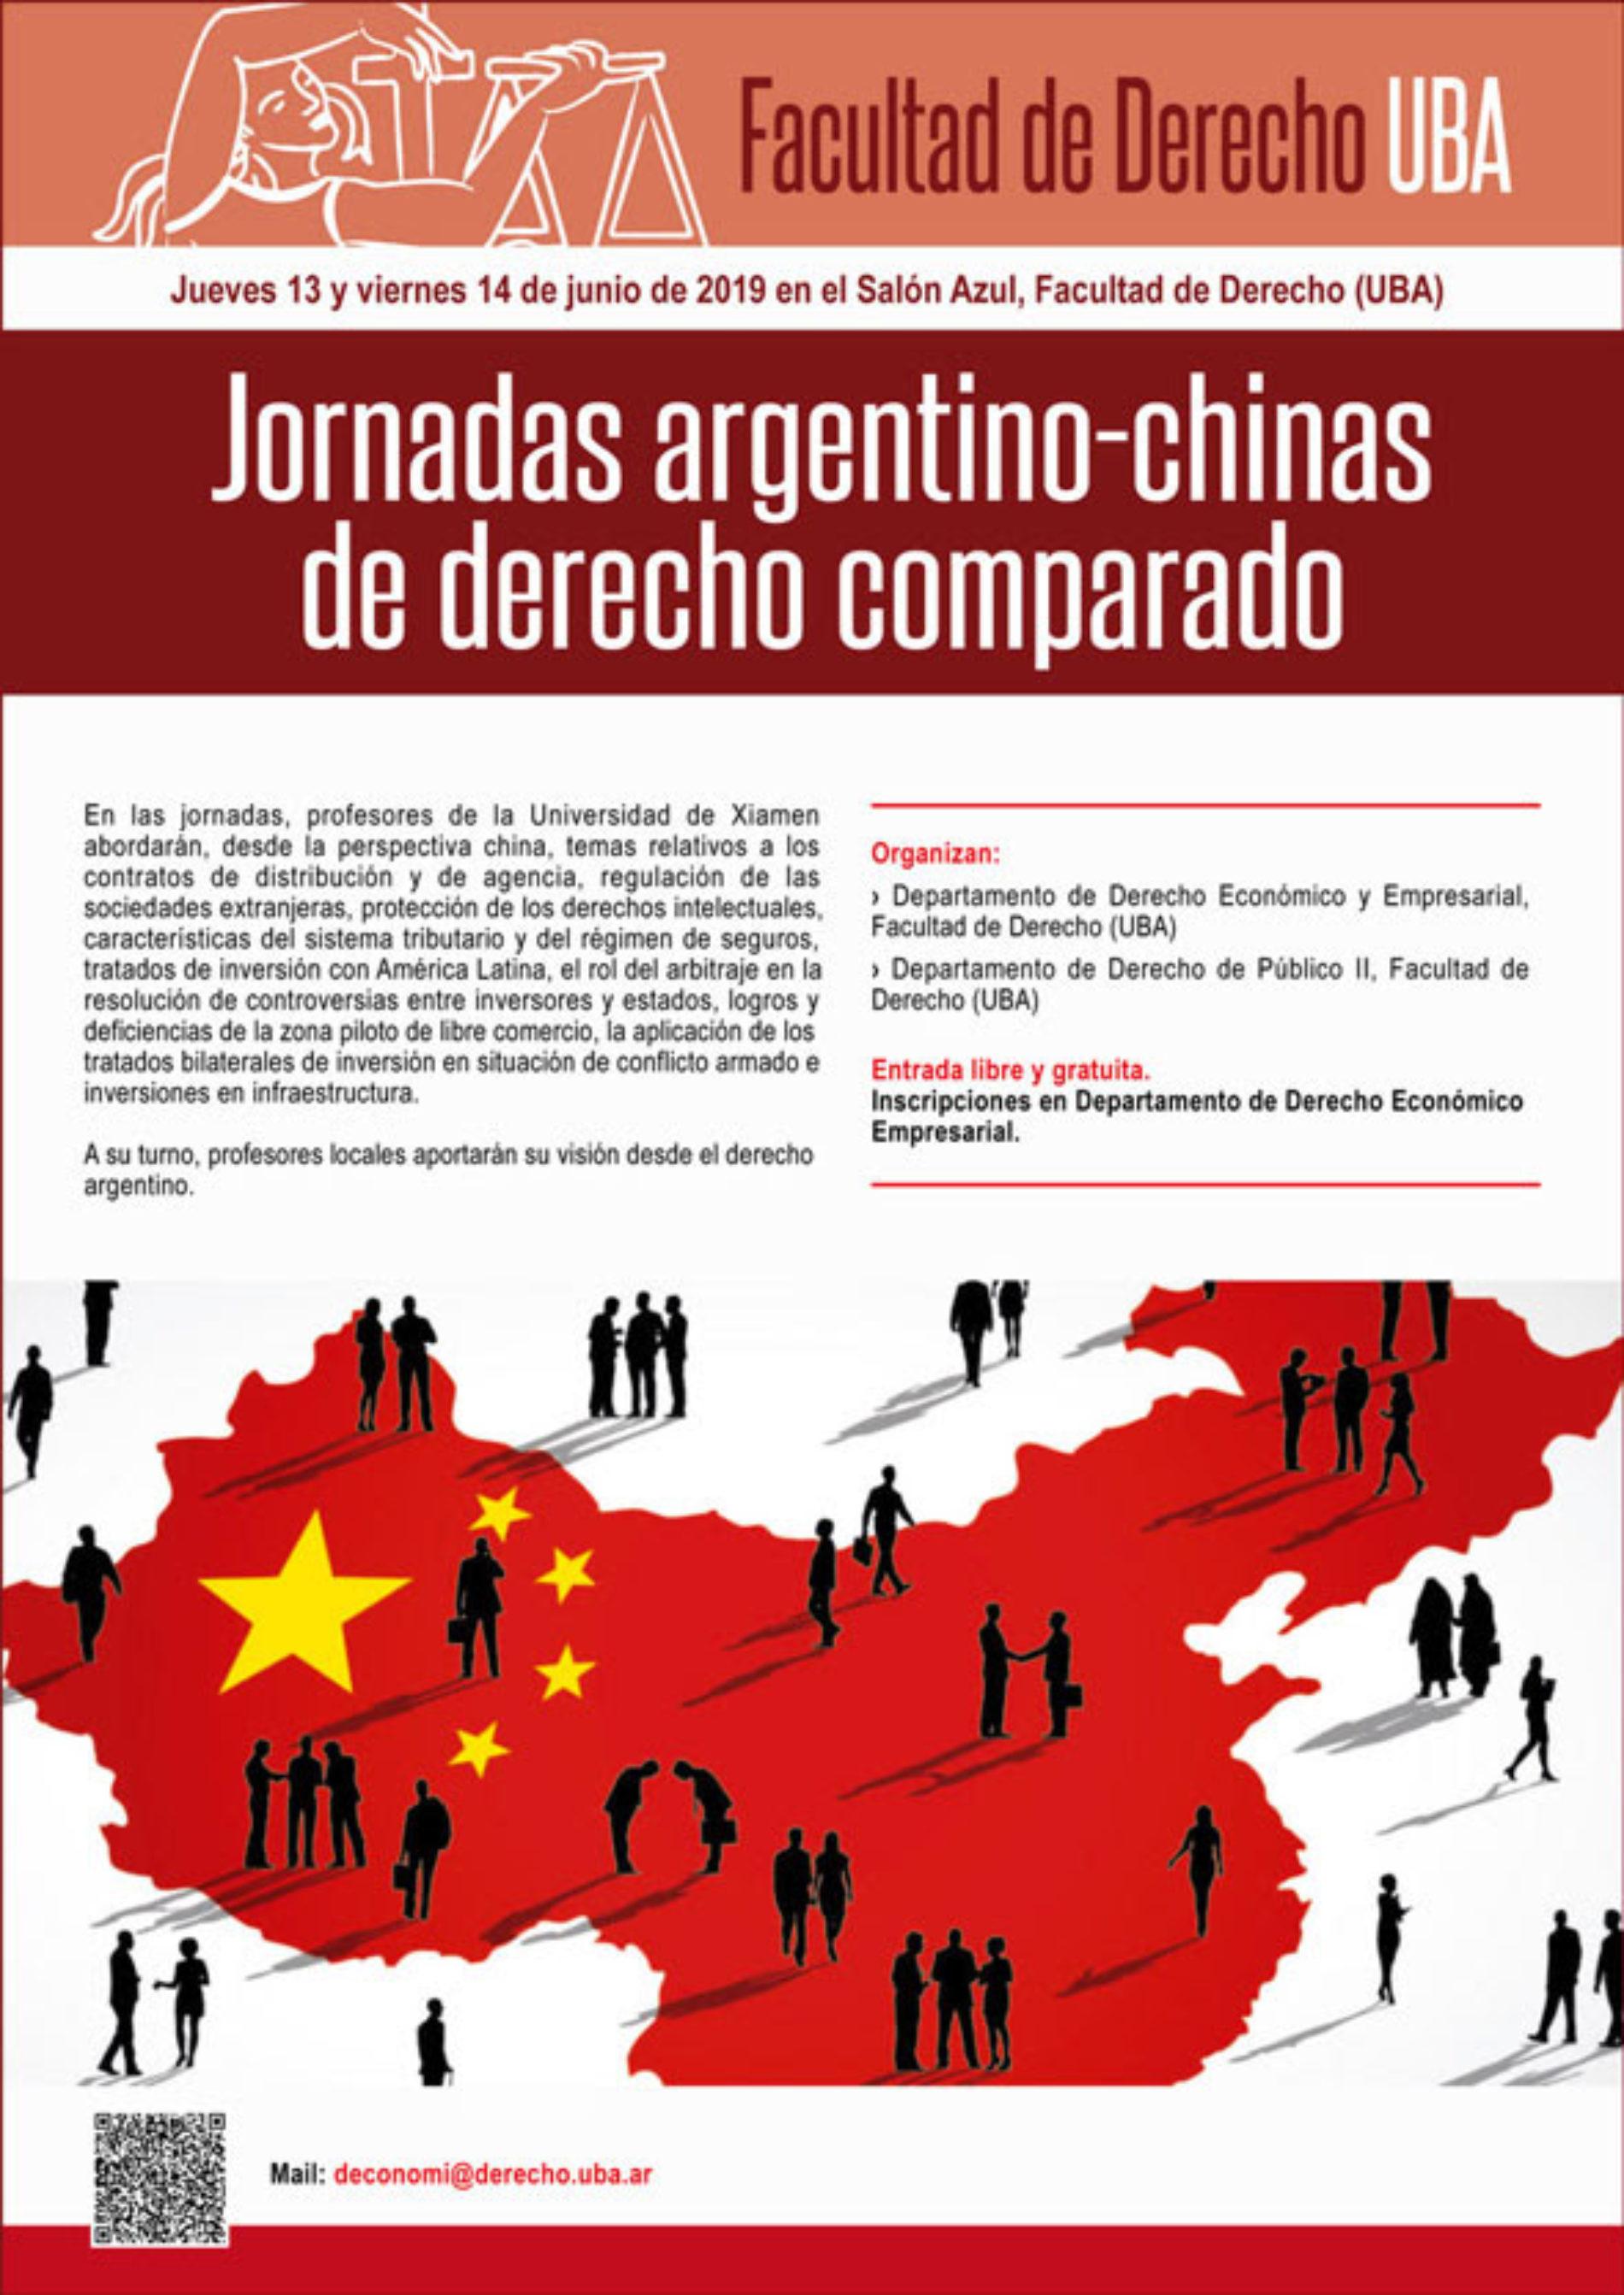 Jornadas argentino-chinas de derecho comparado